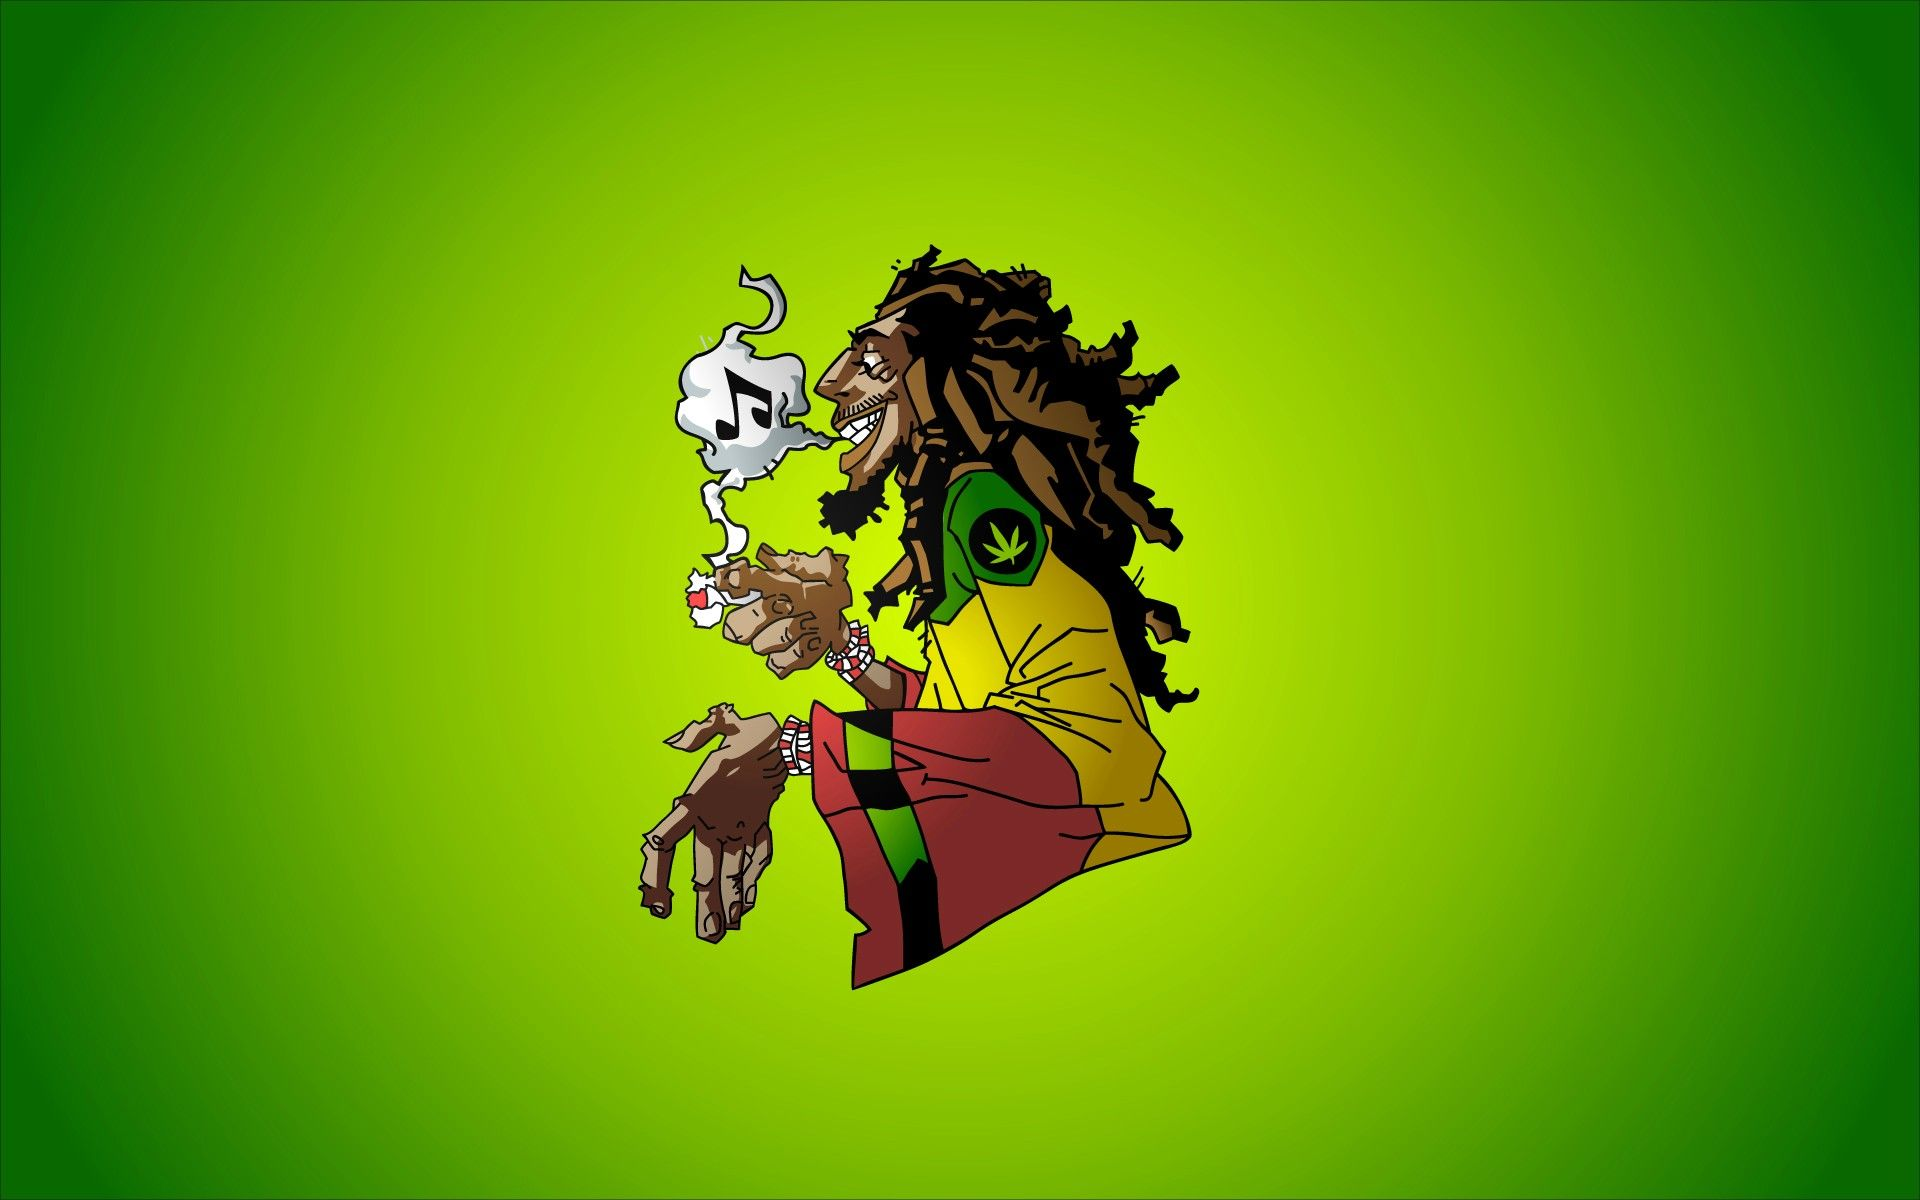 Dreads Girl Wallpaper Rasta Weed And Music Hd Wallpaper Desktop Http